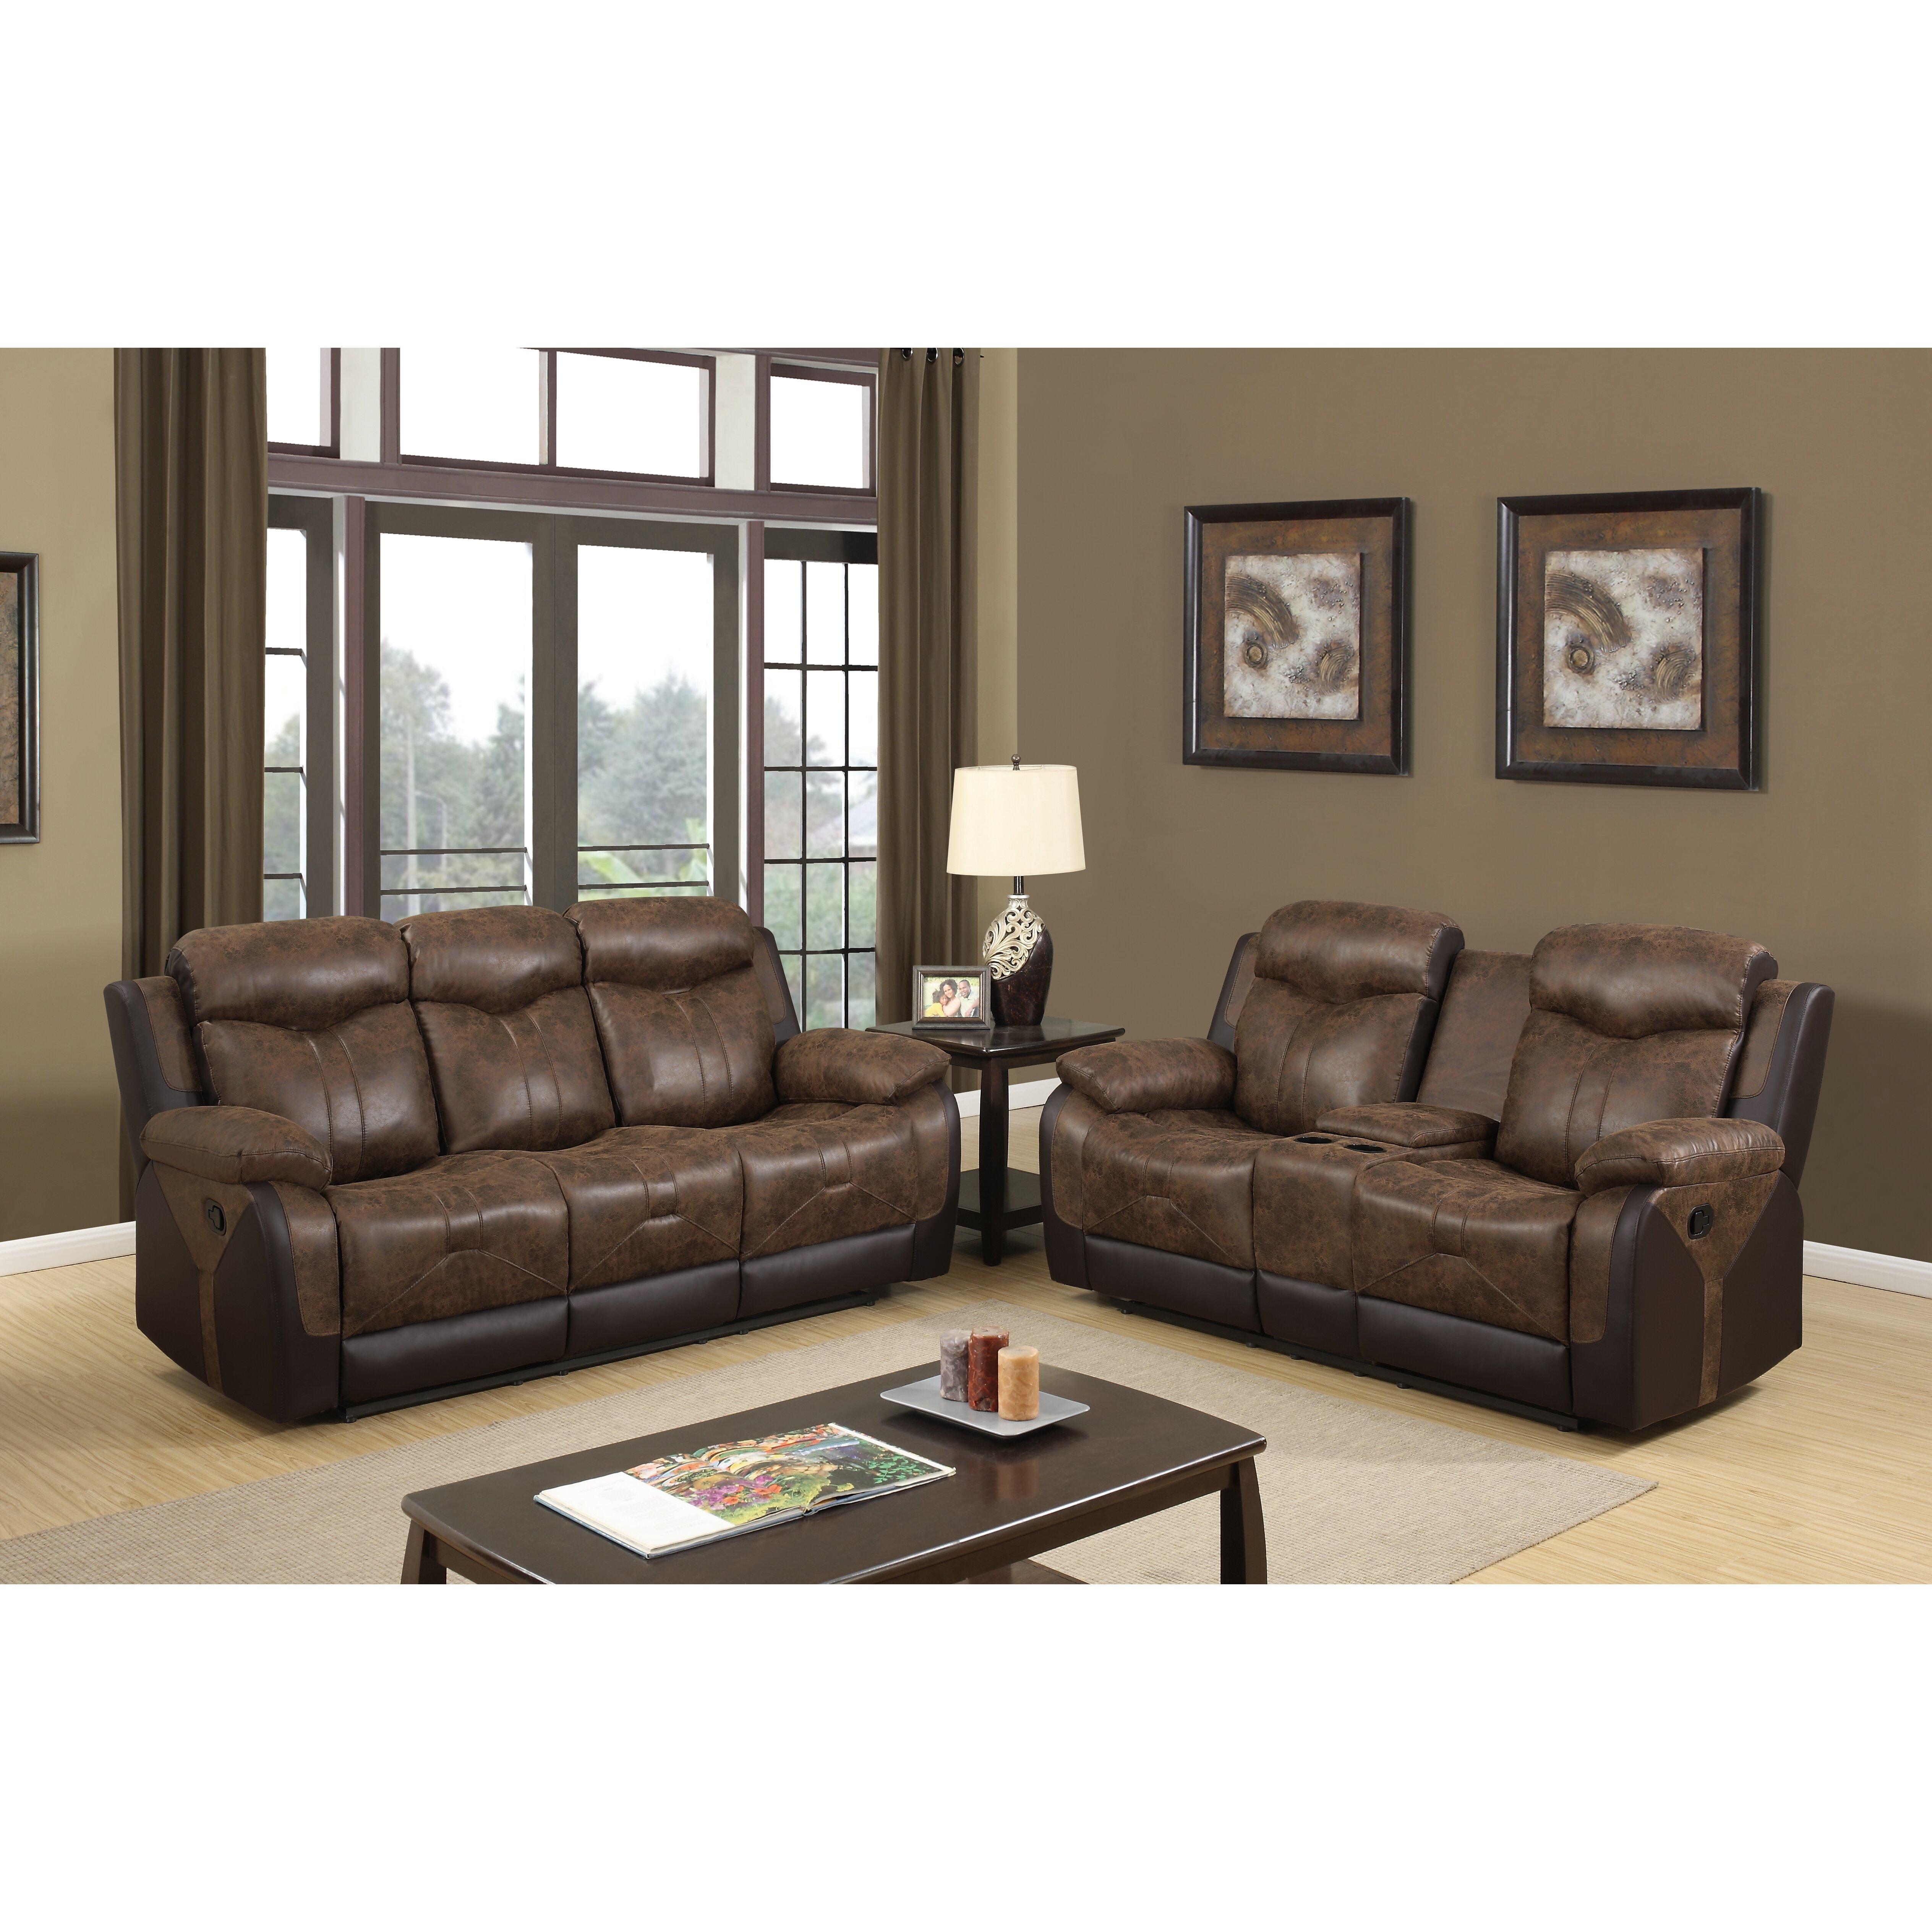 Global furniture usa reclining sofa wayfair for Buy sofa online usa